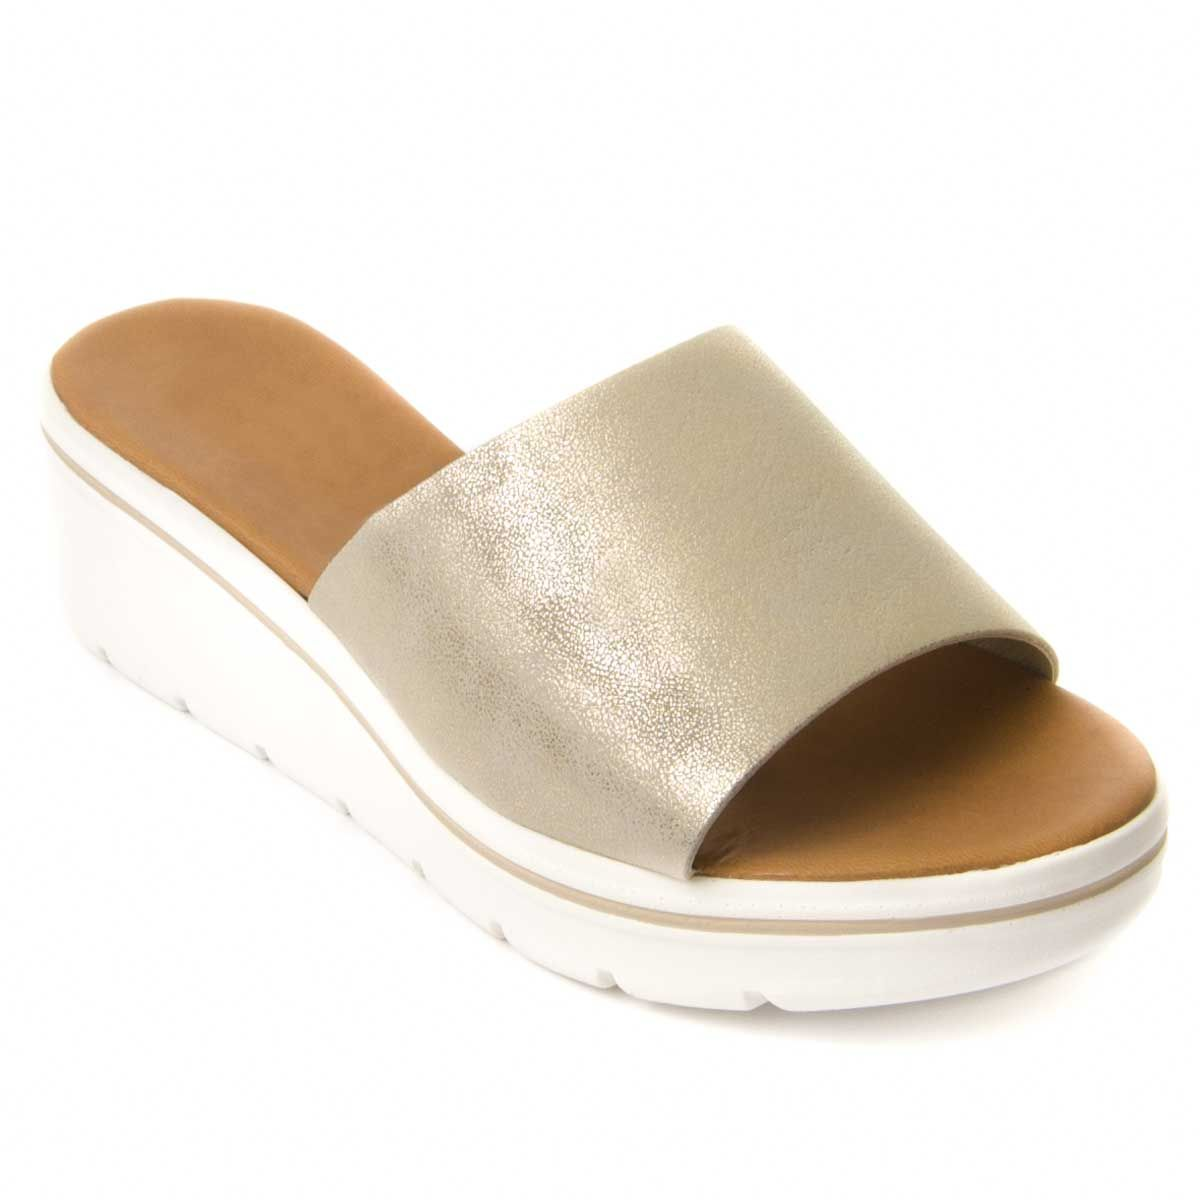 Montevita Chunky Heel Sandal in Gold